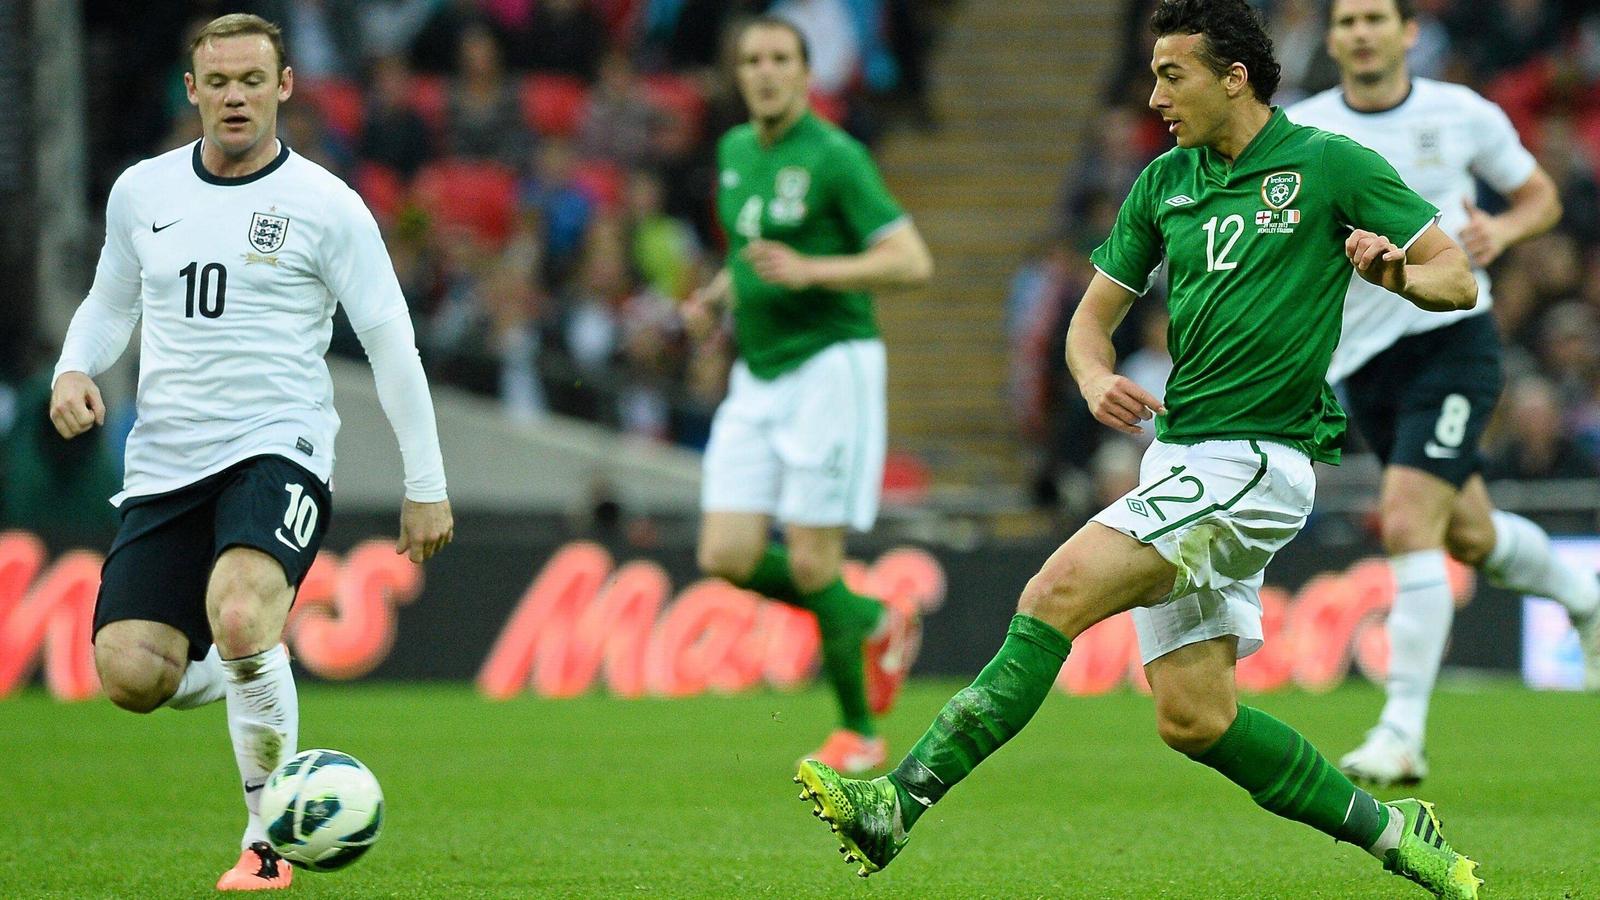 Ireland's Wembley friendly against England live on RTÉ